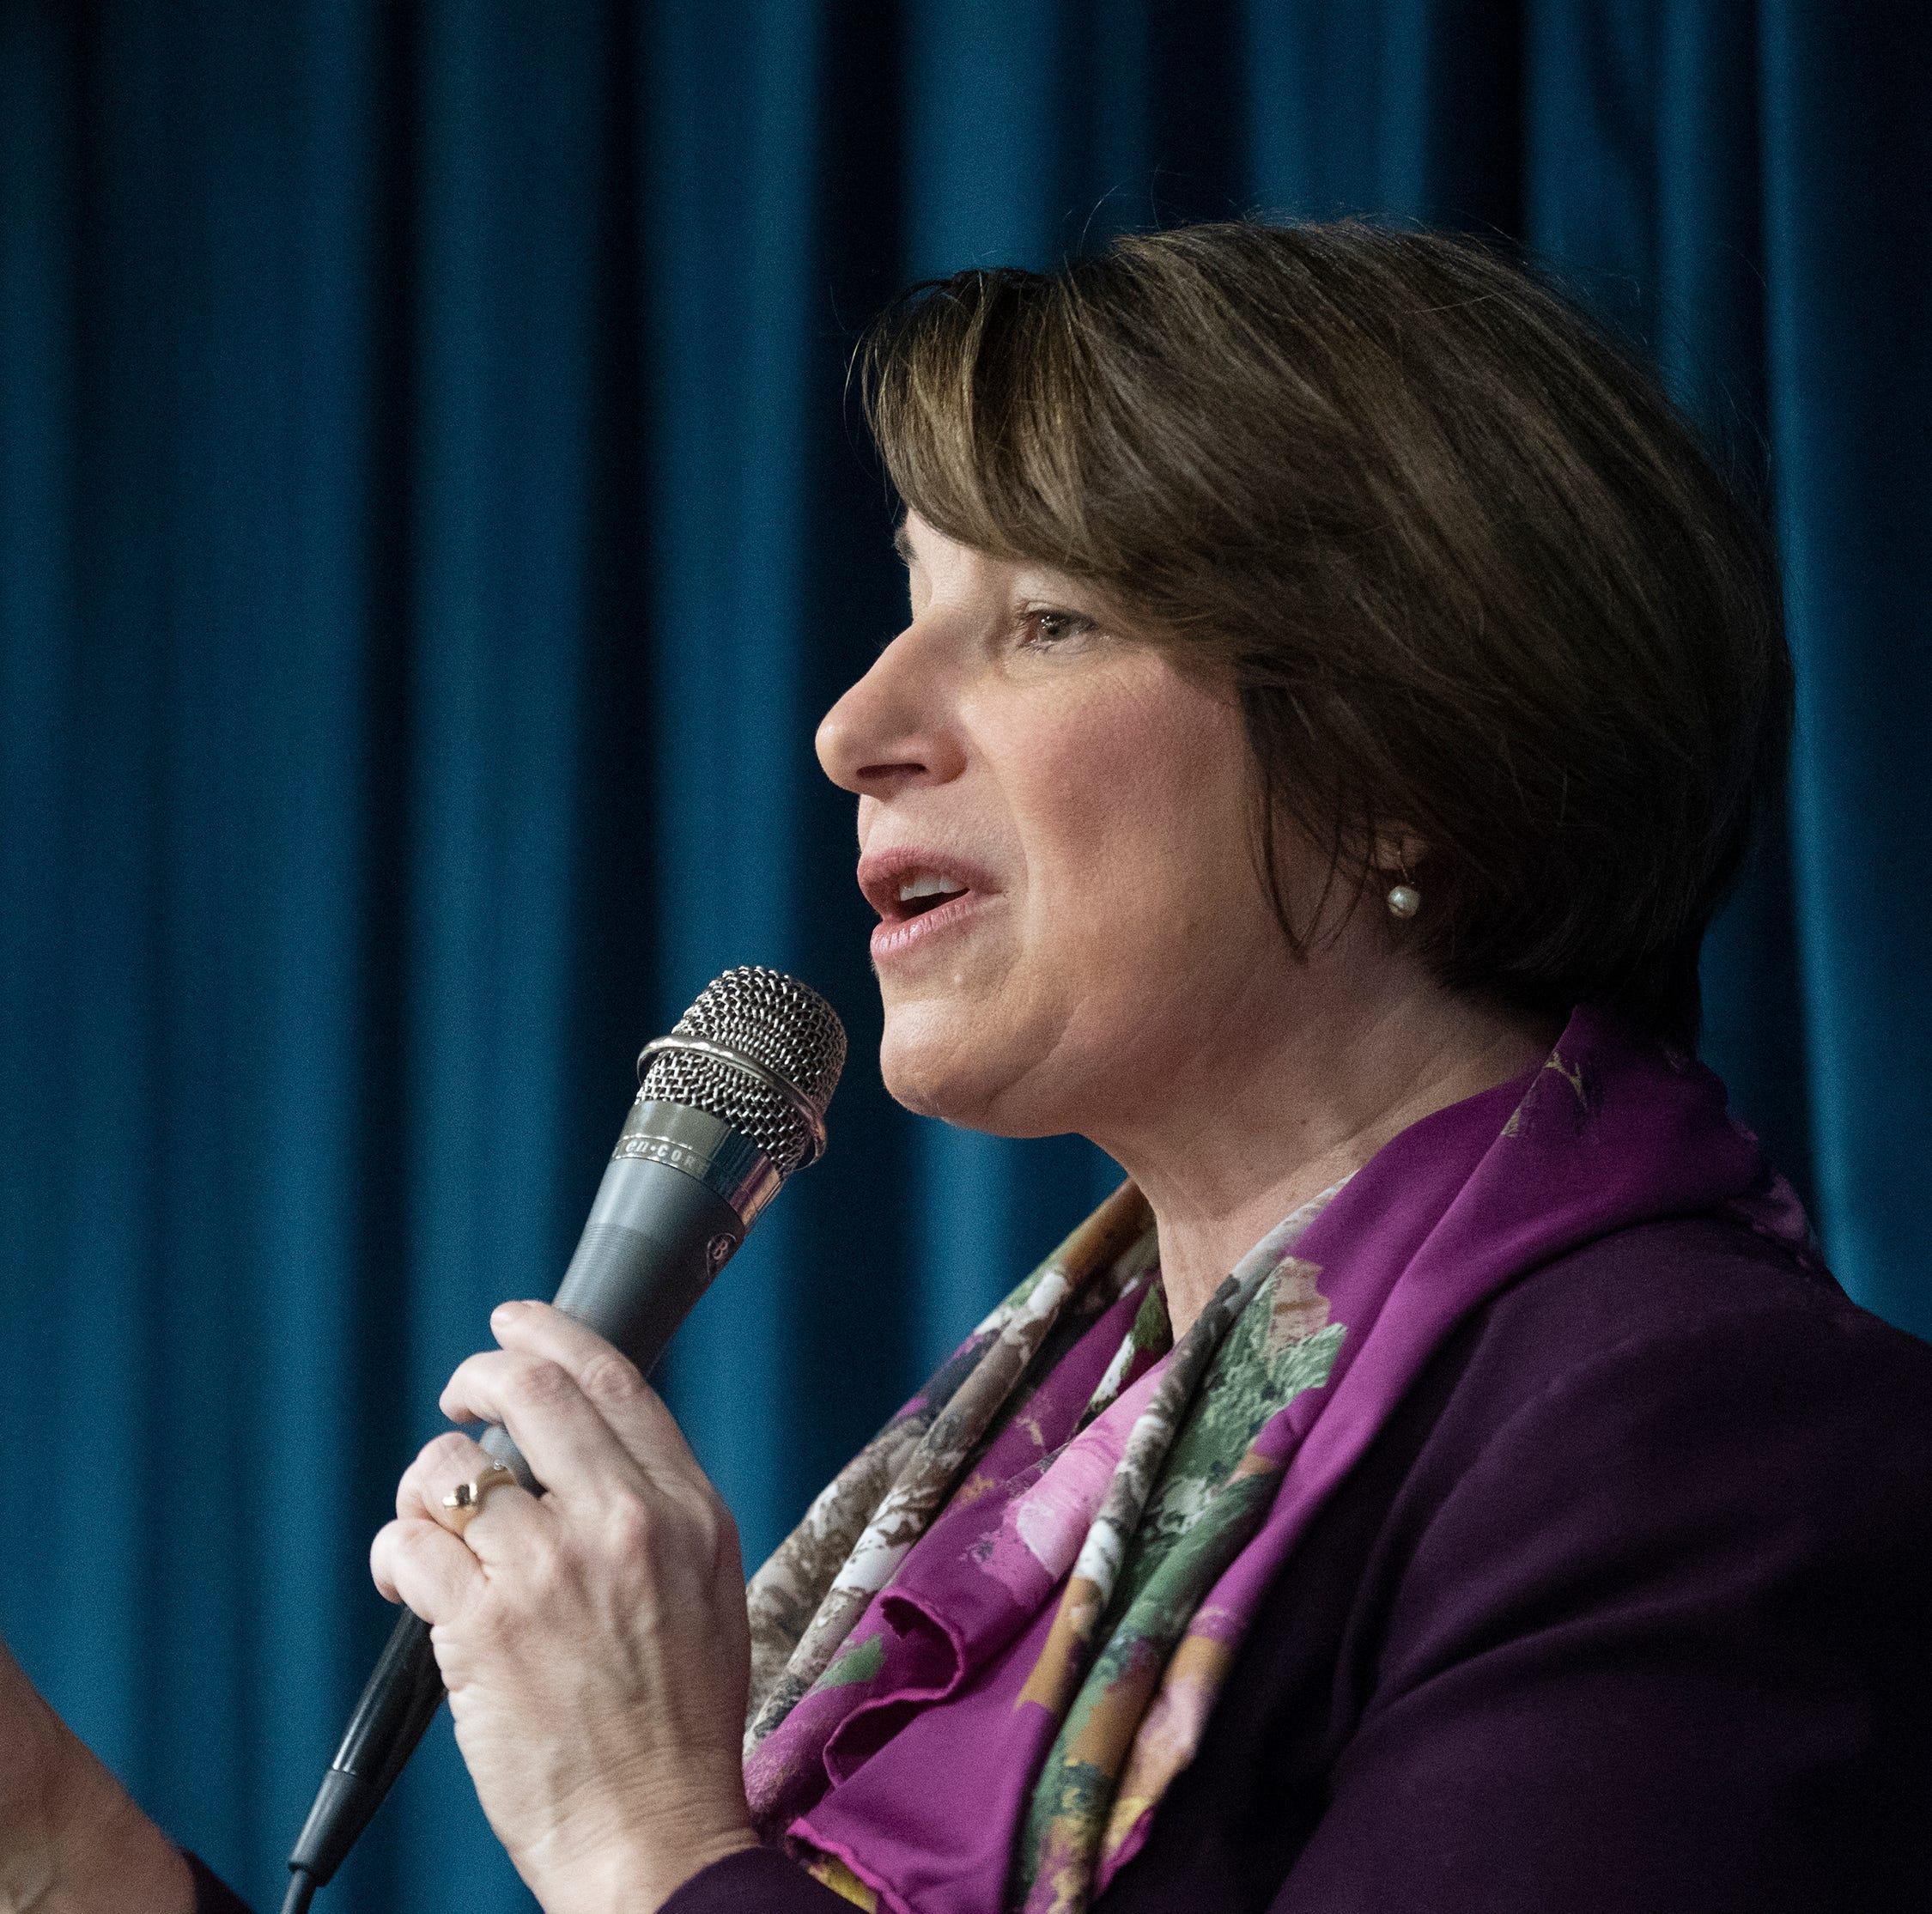 Key takeaways from Amy Klobuchar's campaign stop in Greenville